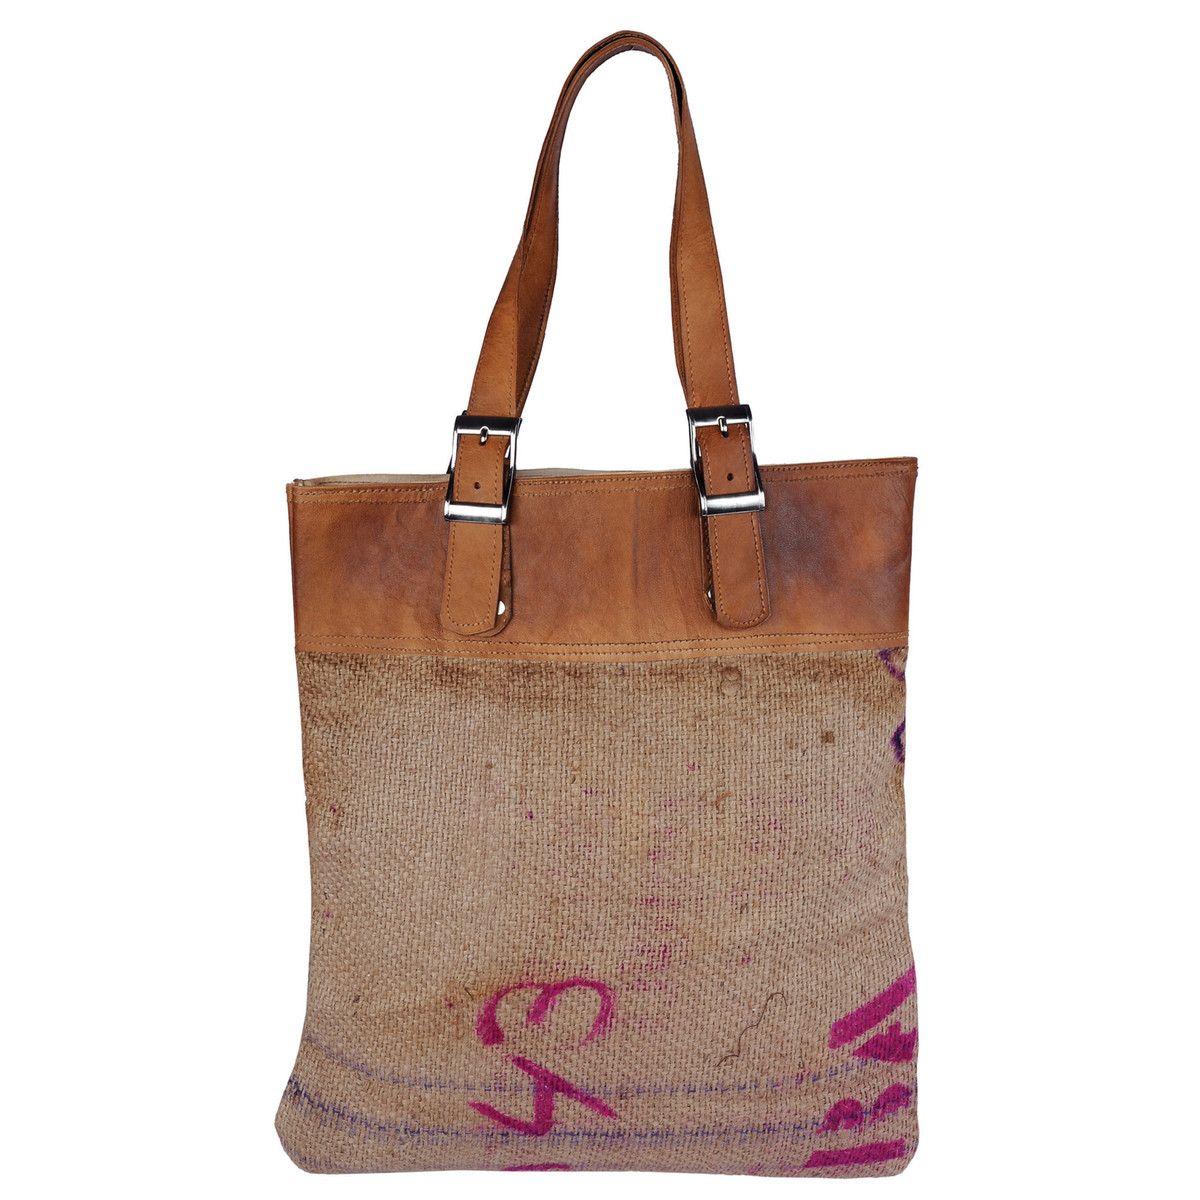 Bag or Tote Karma Living cotton hand crafted environmentally friendly Boho bag